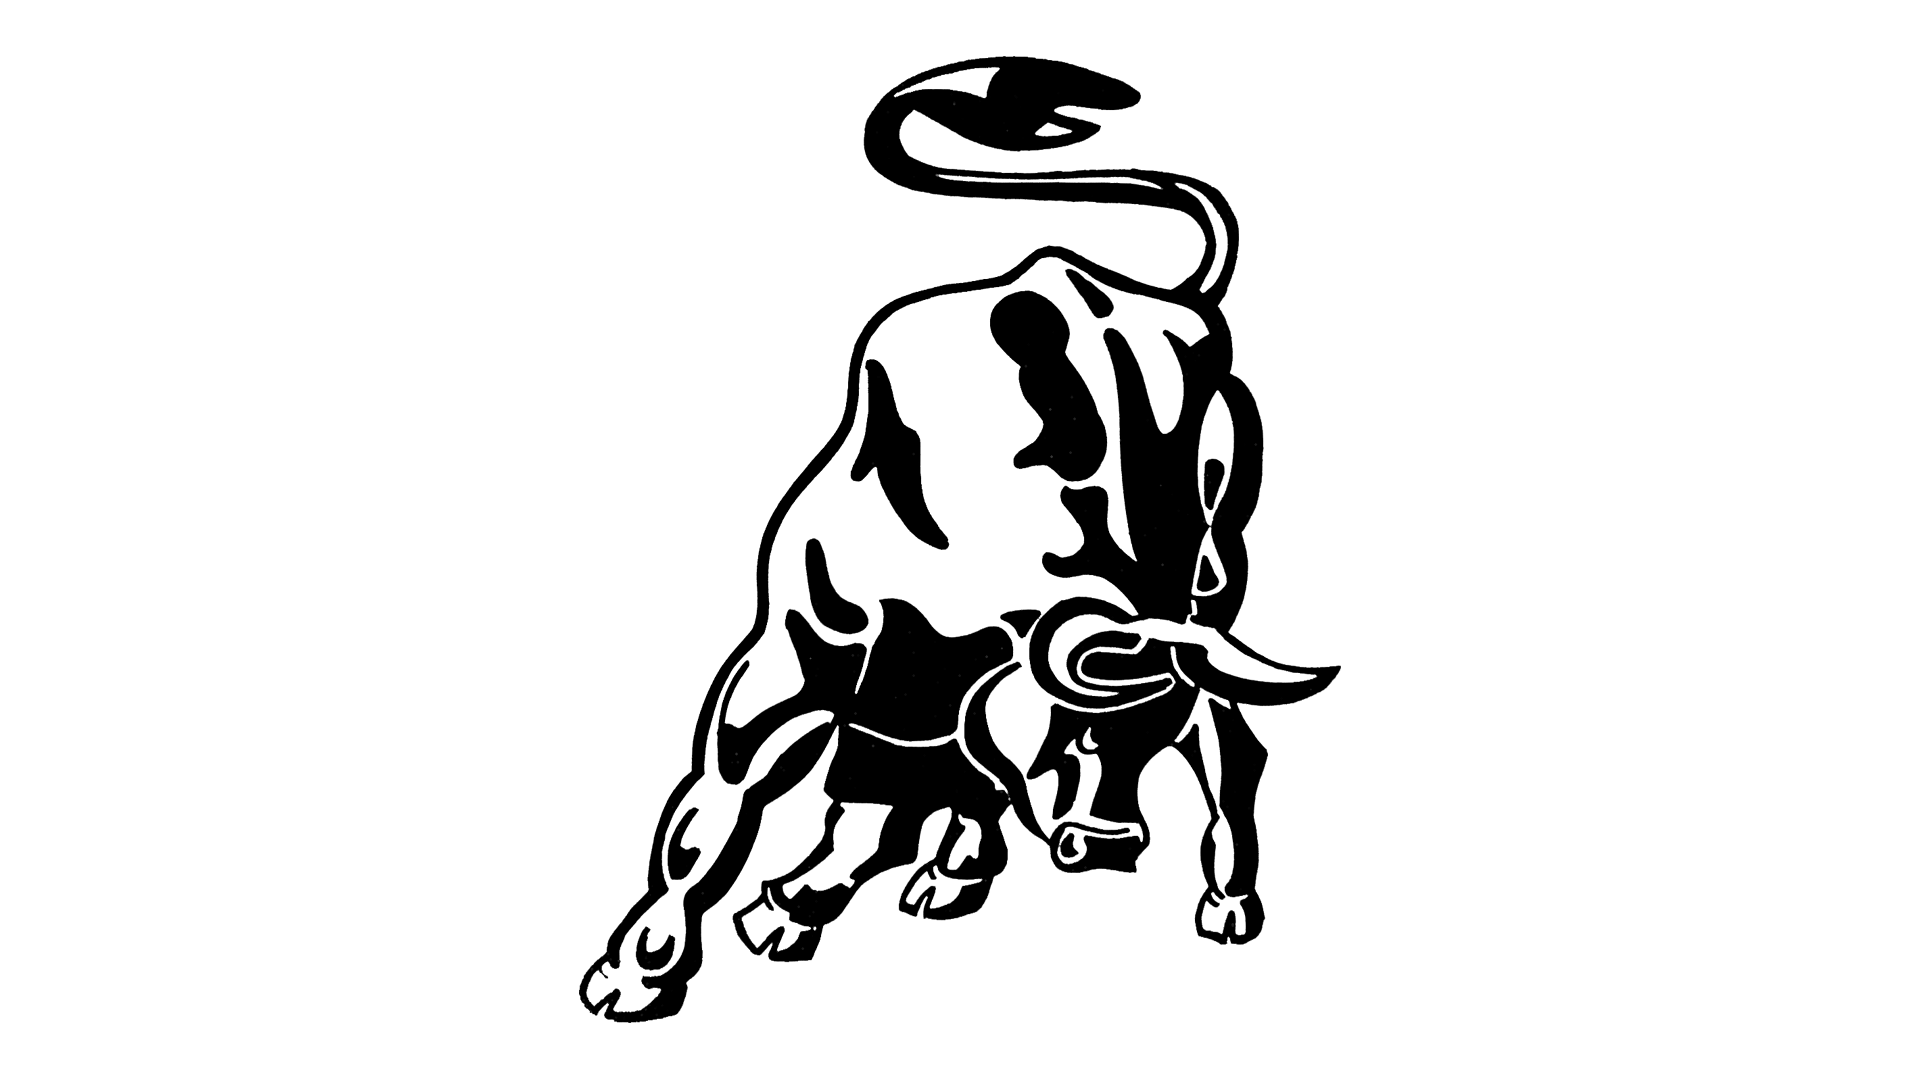 1920x1080 Lamborghini Drawing Logo Png Images